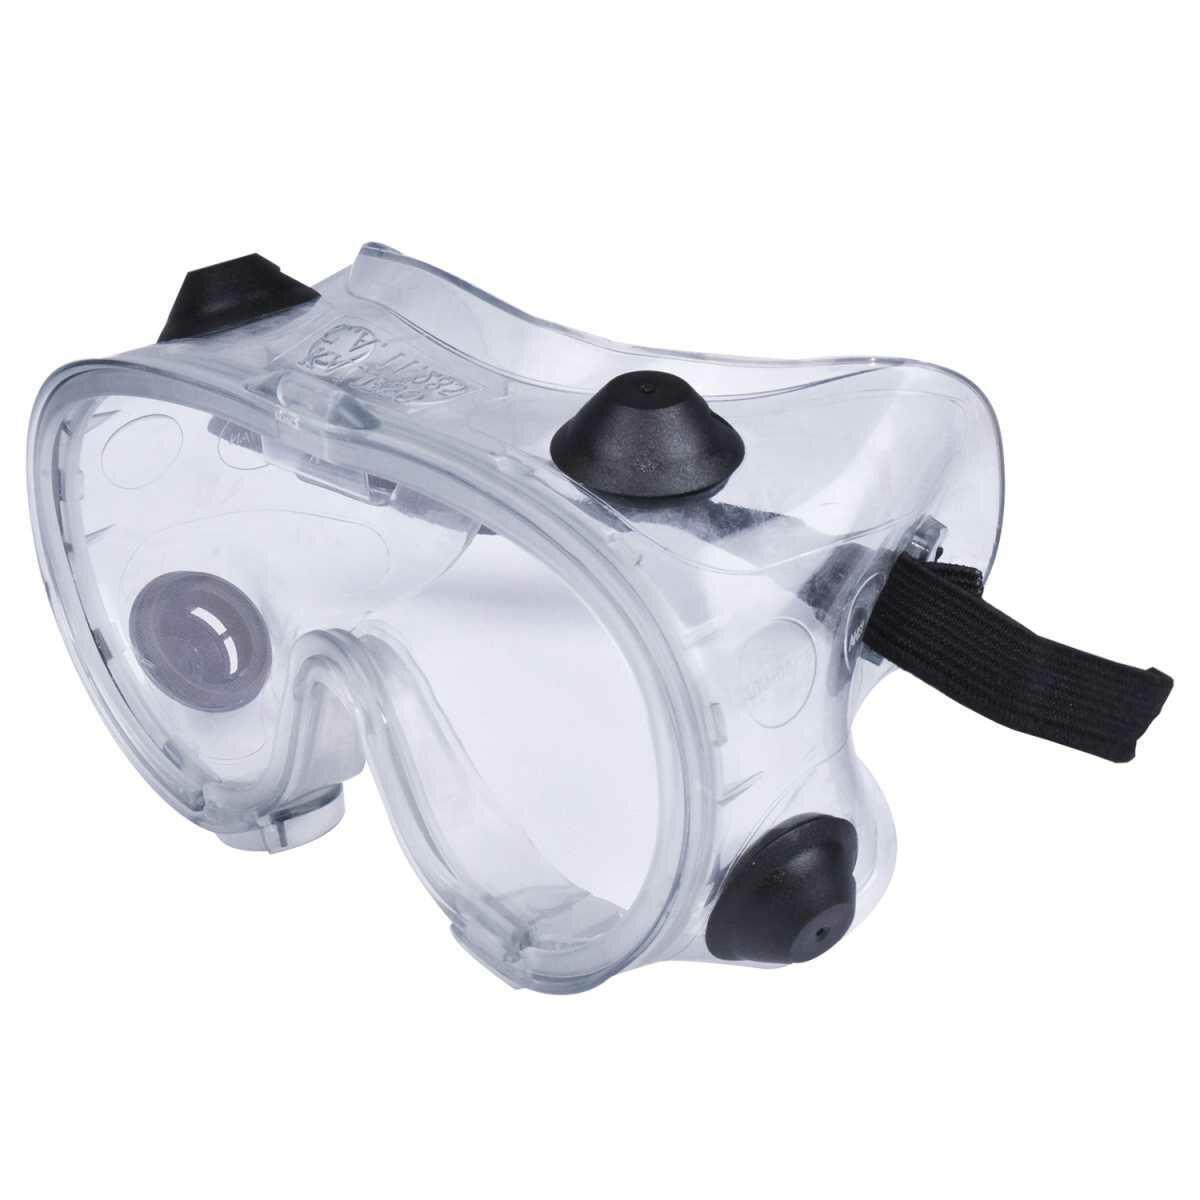 Óculos de Segurança Incolor Tipo Rã Kalipso